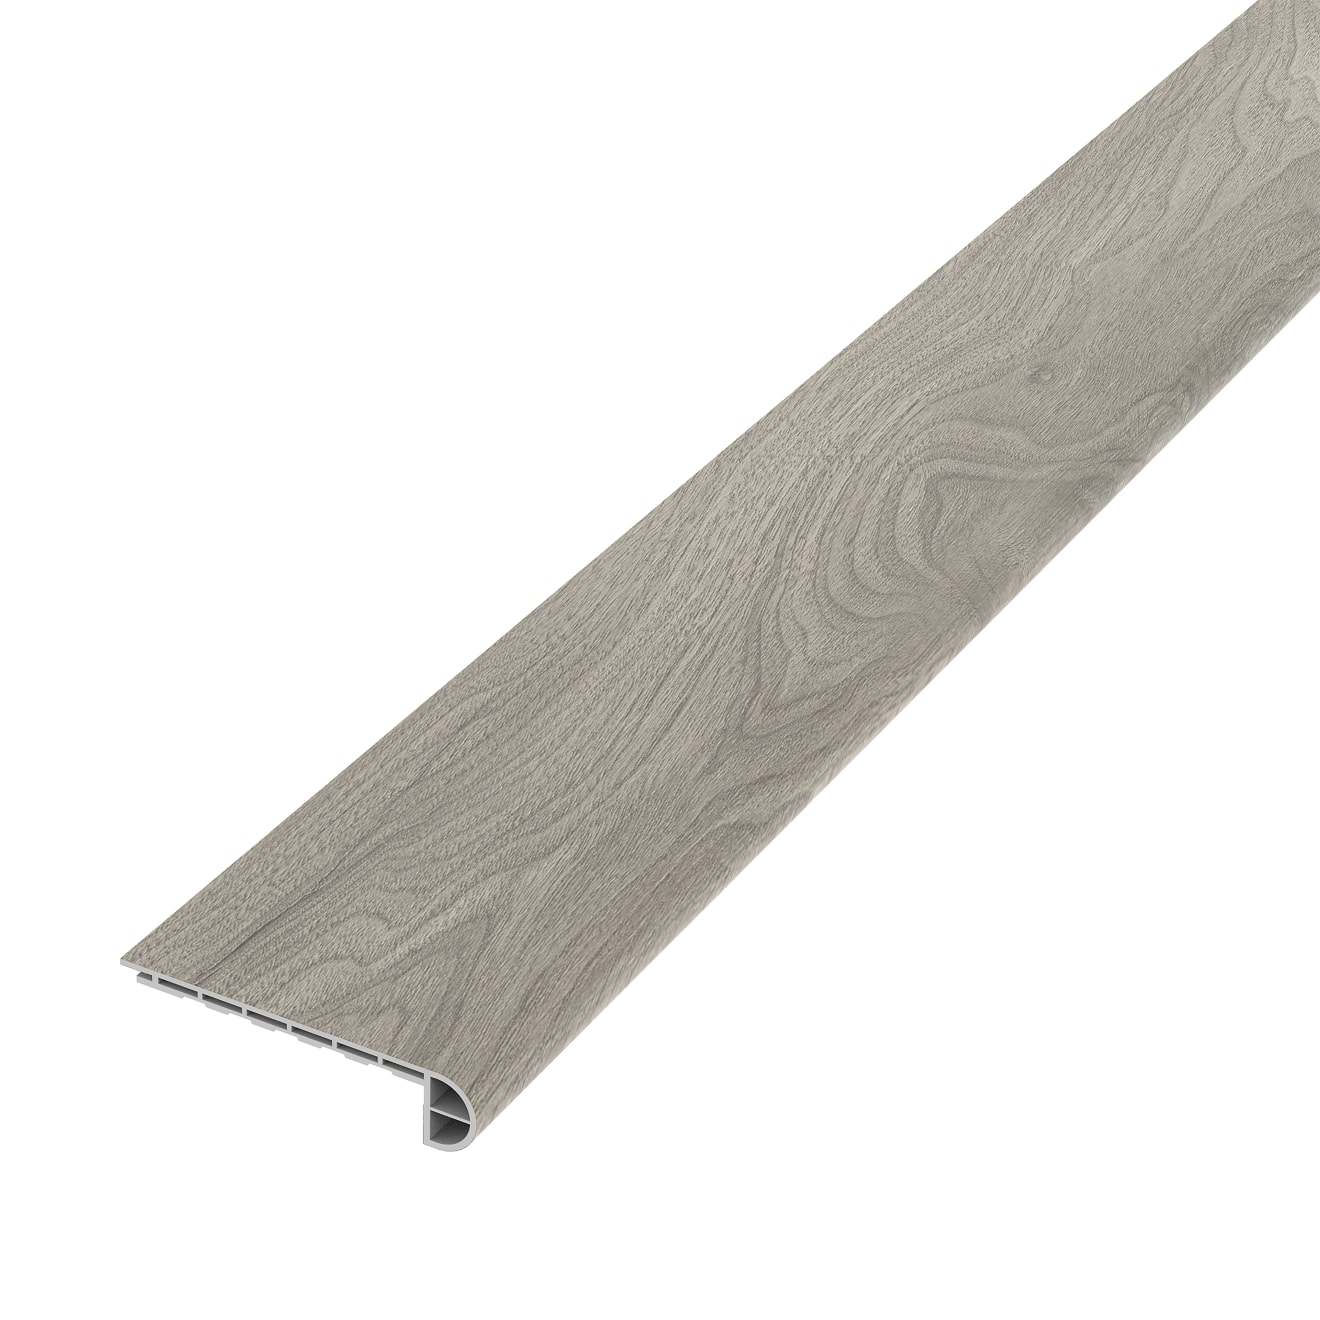 Cassio Luxury SPC Vinyl Stair Nose Trim in Grey